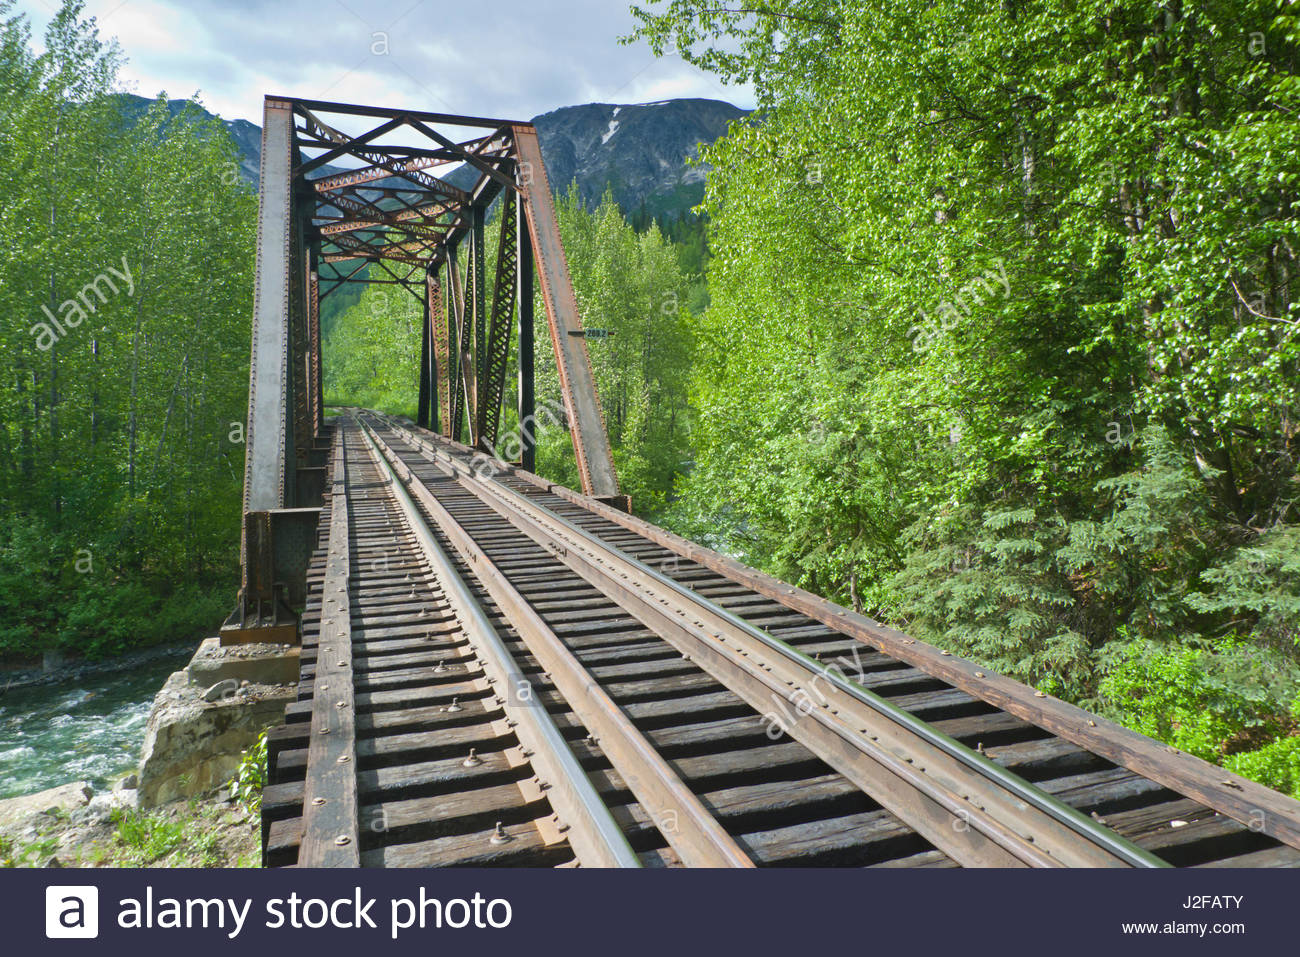 Alaska matanuska susitna county talkeetna - Metal Railroad Bridge Spanning The Indian River Talkeetna Mountains Matanuska Susitna Borough